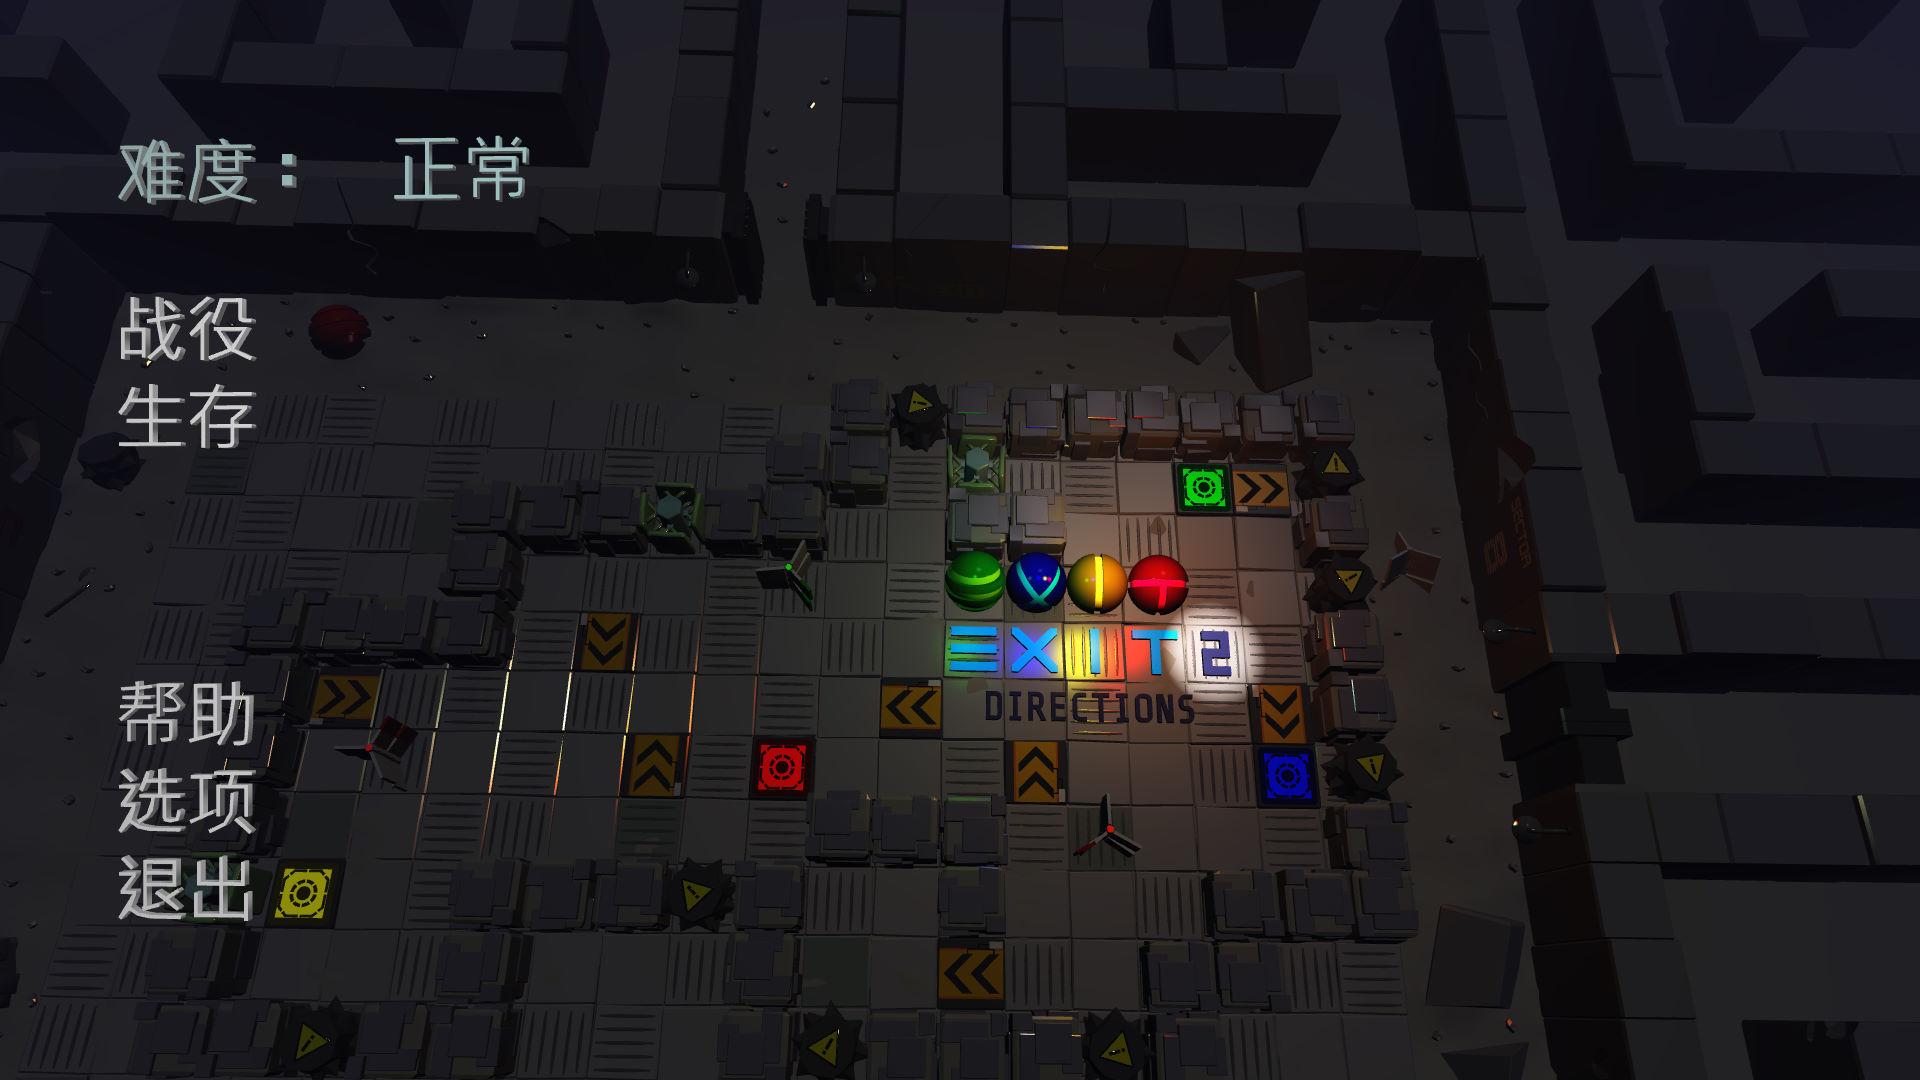 EXIT 2 - Directions 中文截图